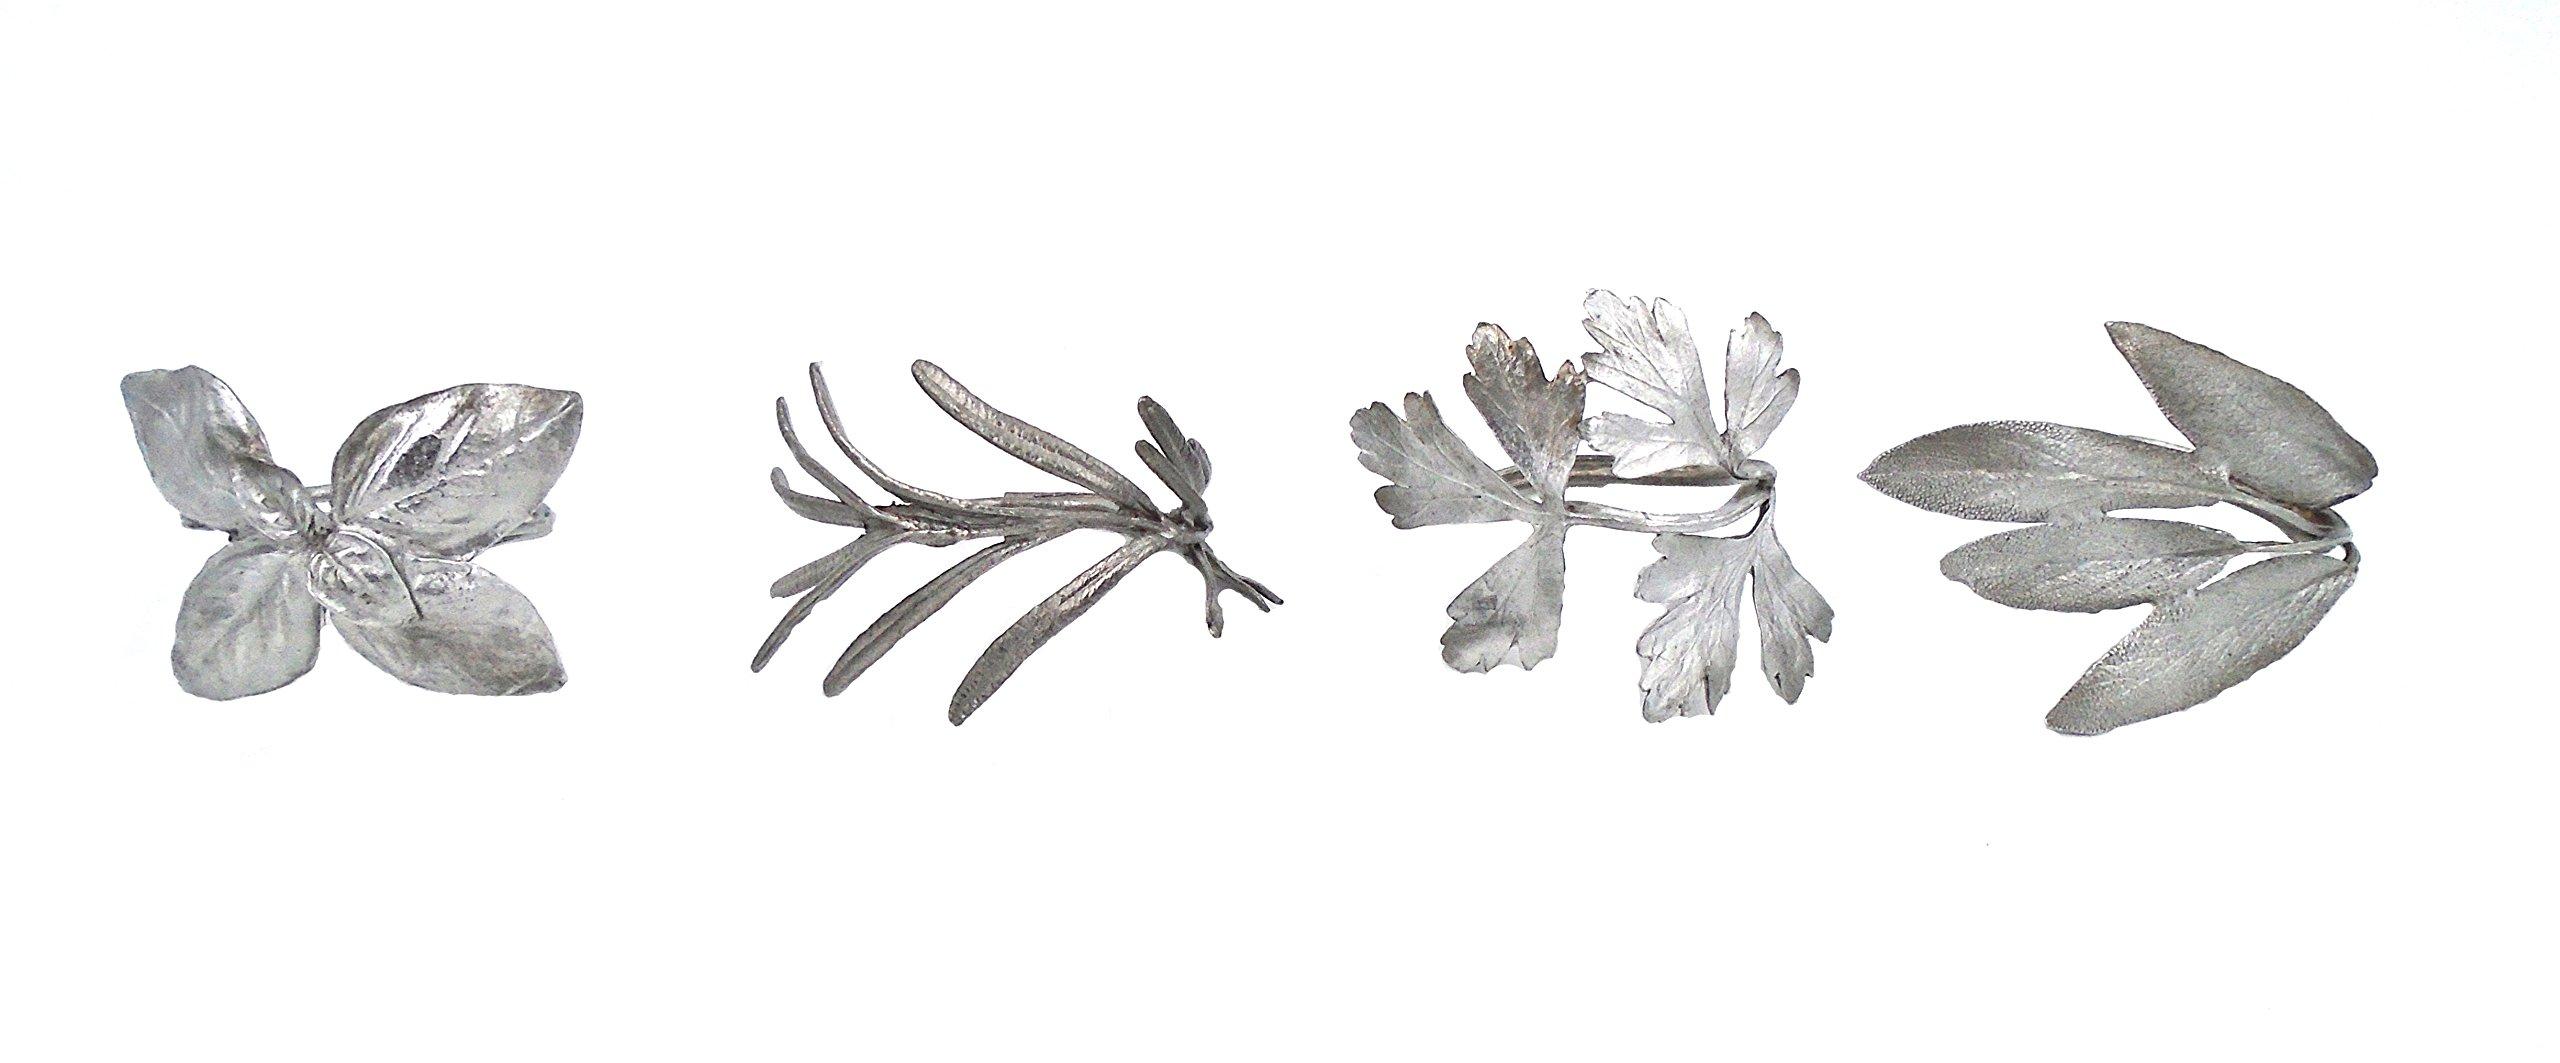 ''Italian Herb Napkin Rings'' (Set of 4) by Michael Michaud for Silver Seasons Table Art